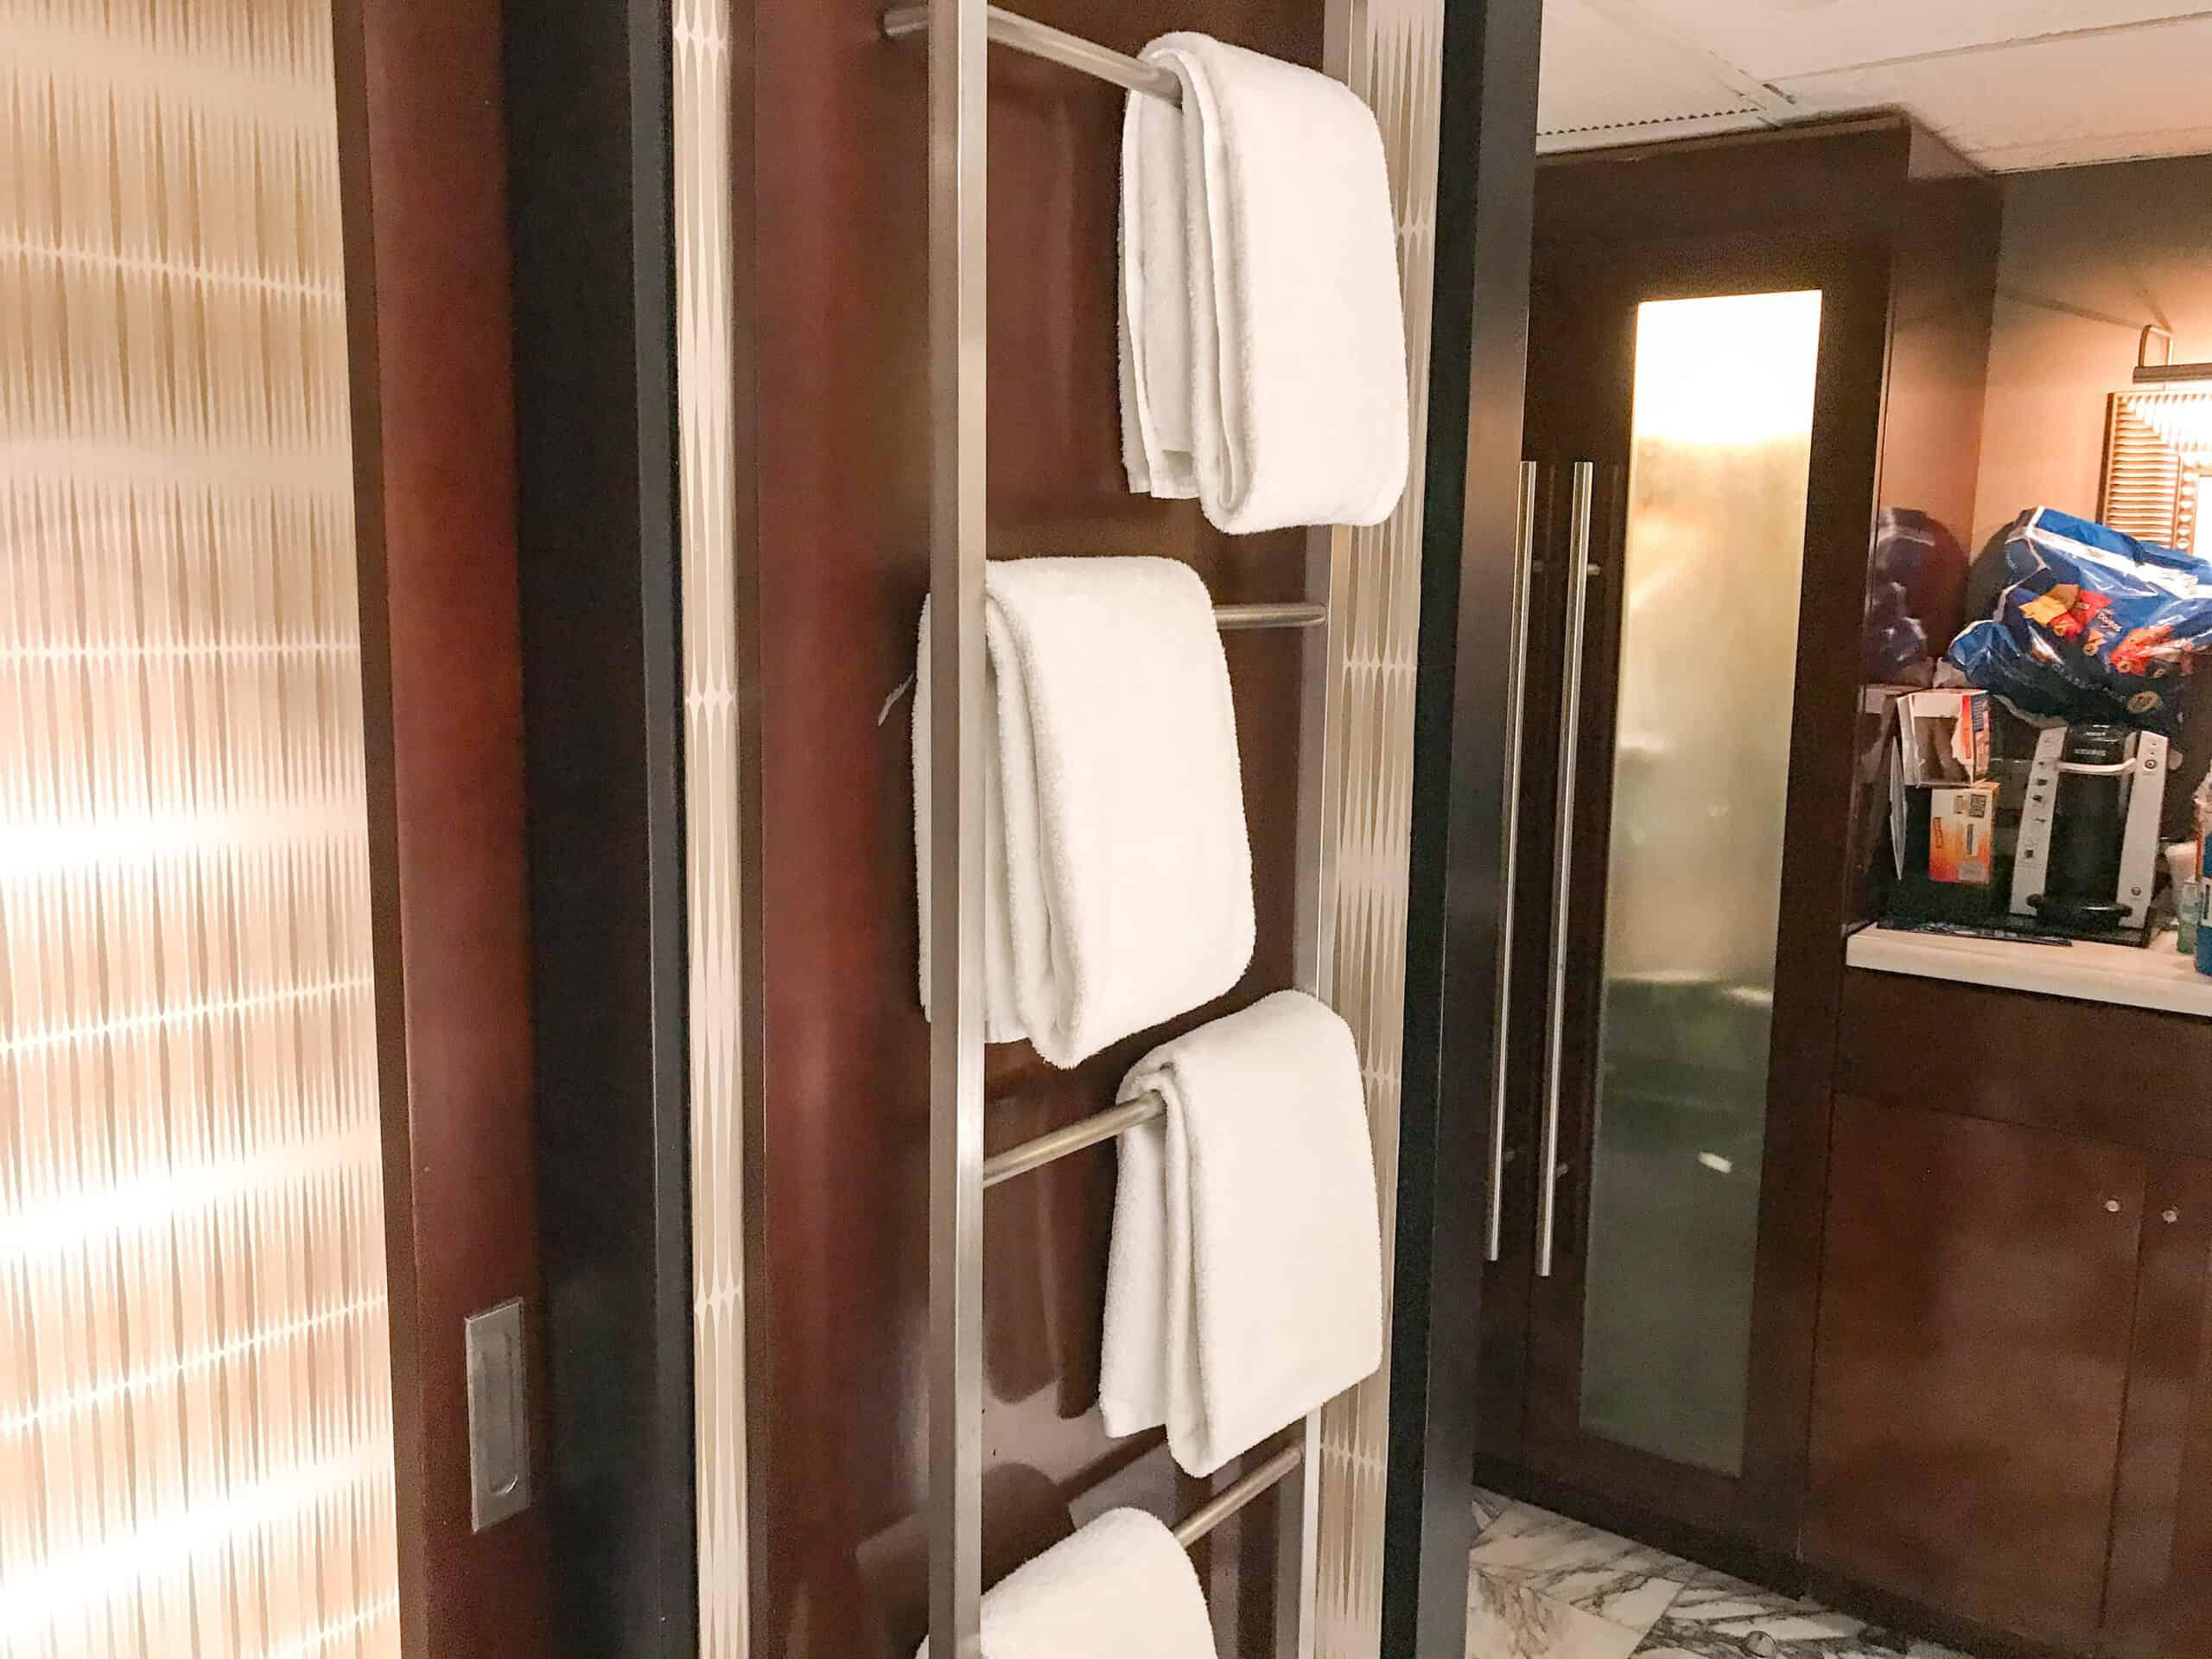 Towel Rack in bathroom at Disney's Contemporary Resot